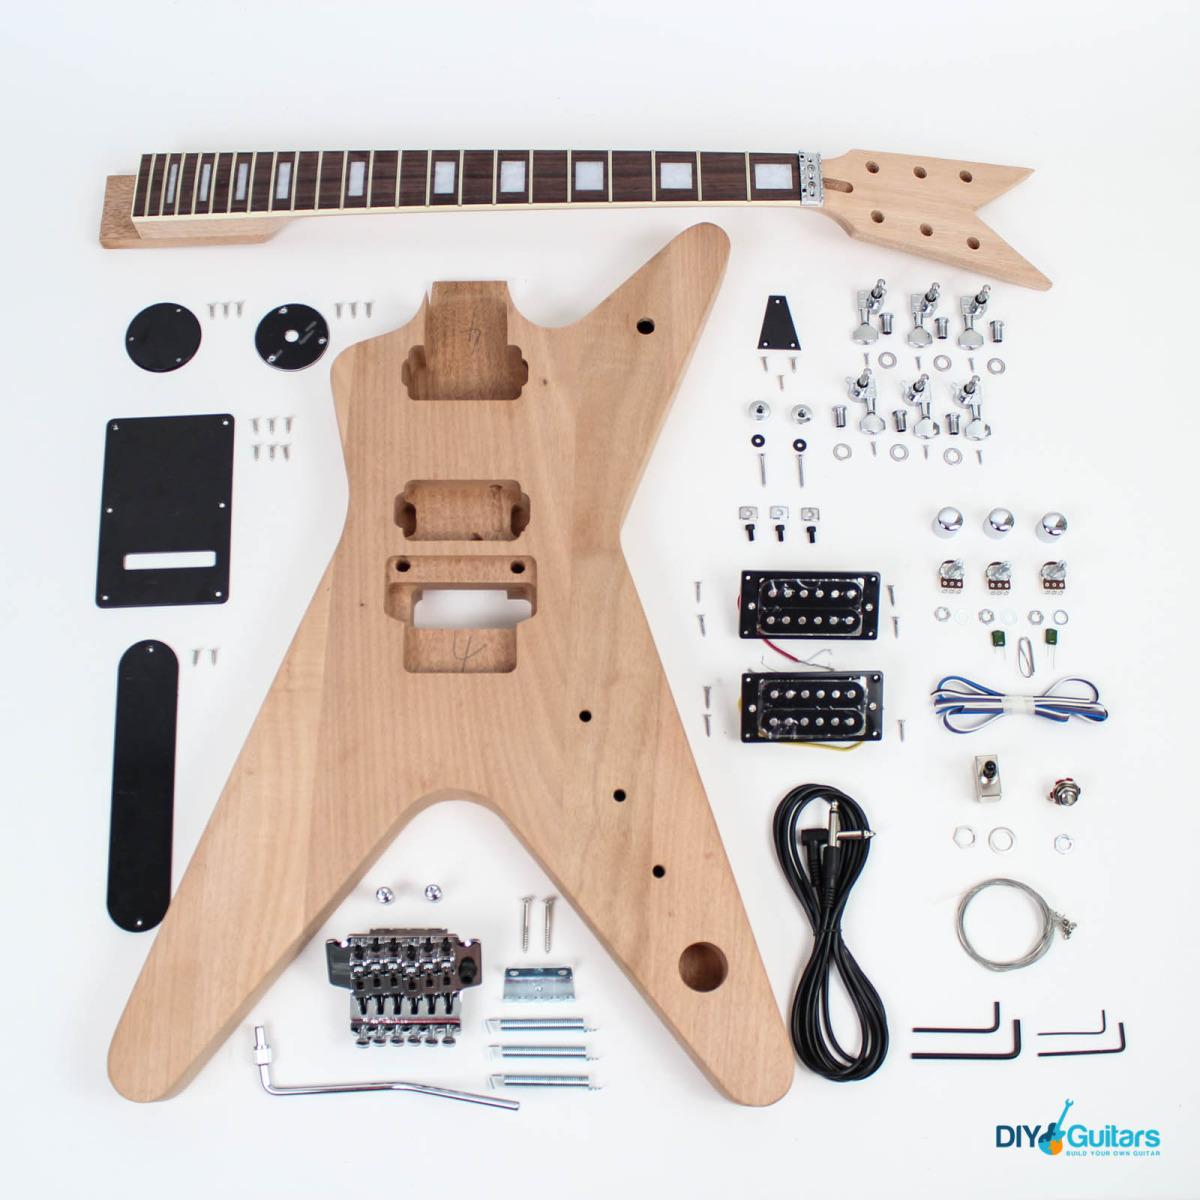 Dean Ml Style Diy Guitar Kit